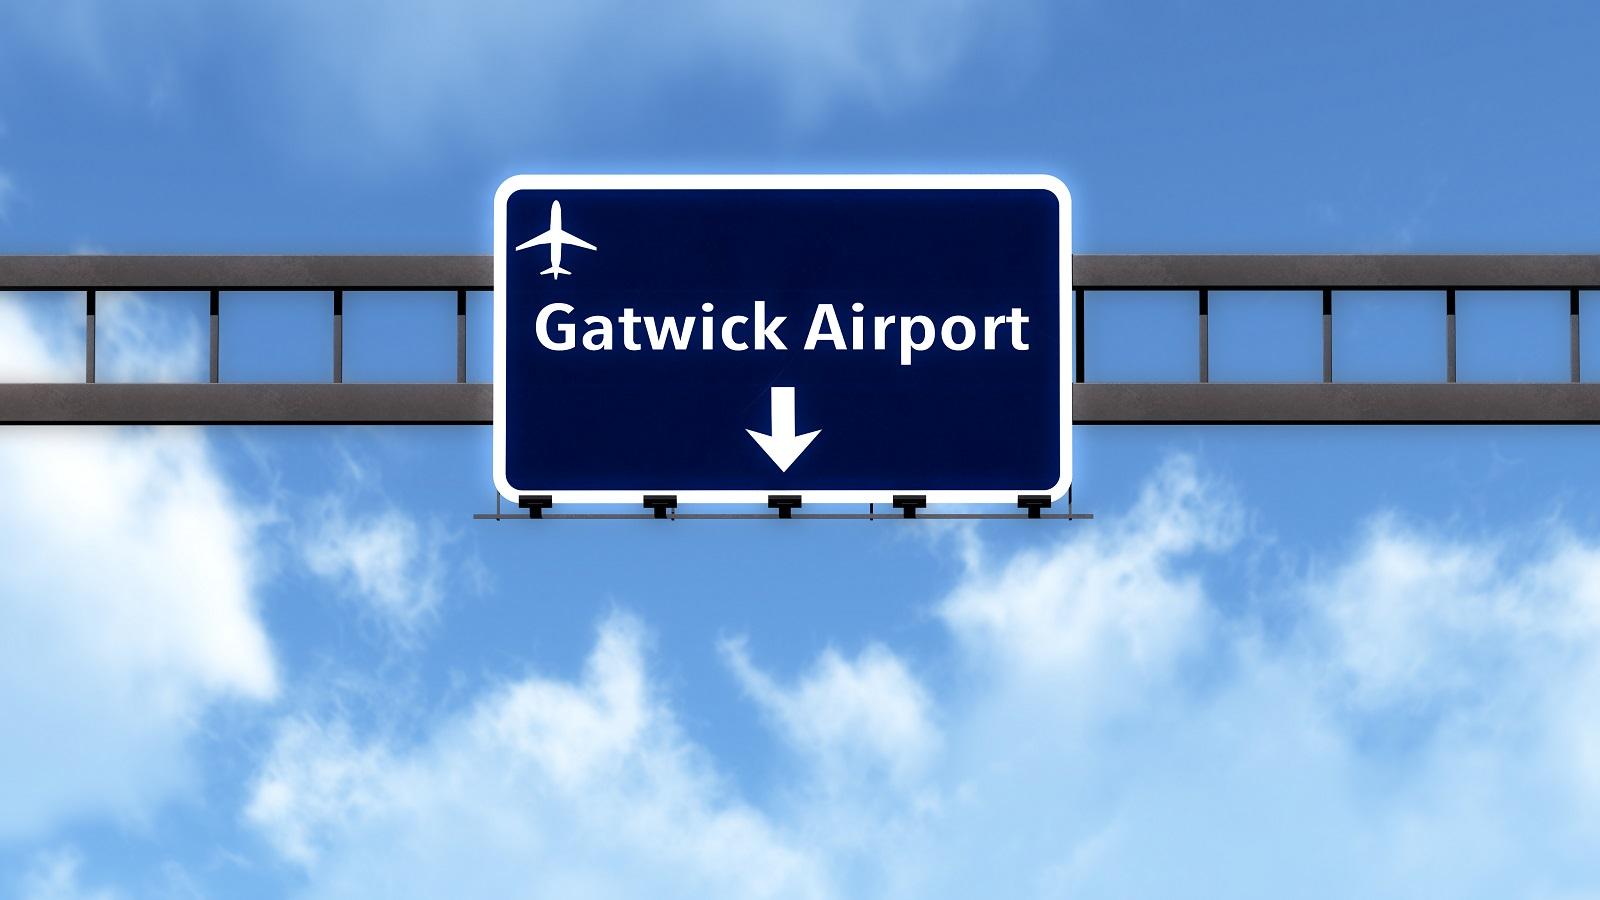 londen gatwick airport